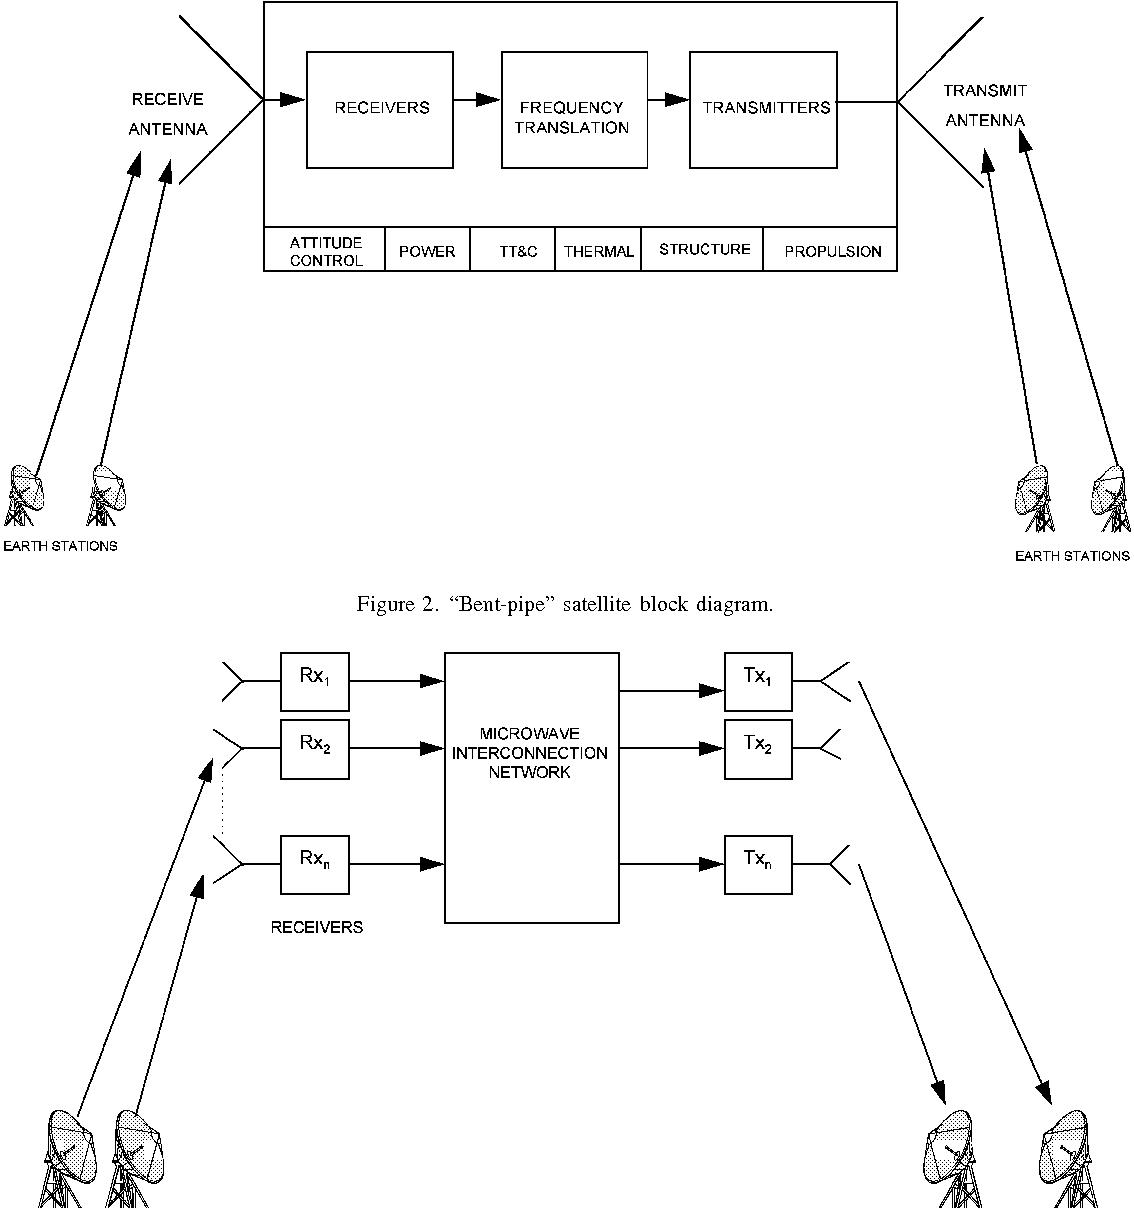 hight resolution of  bent pipe satellite block diagram